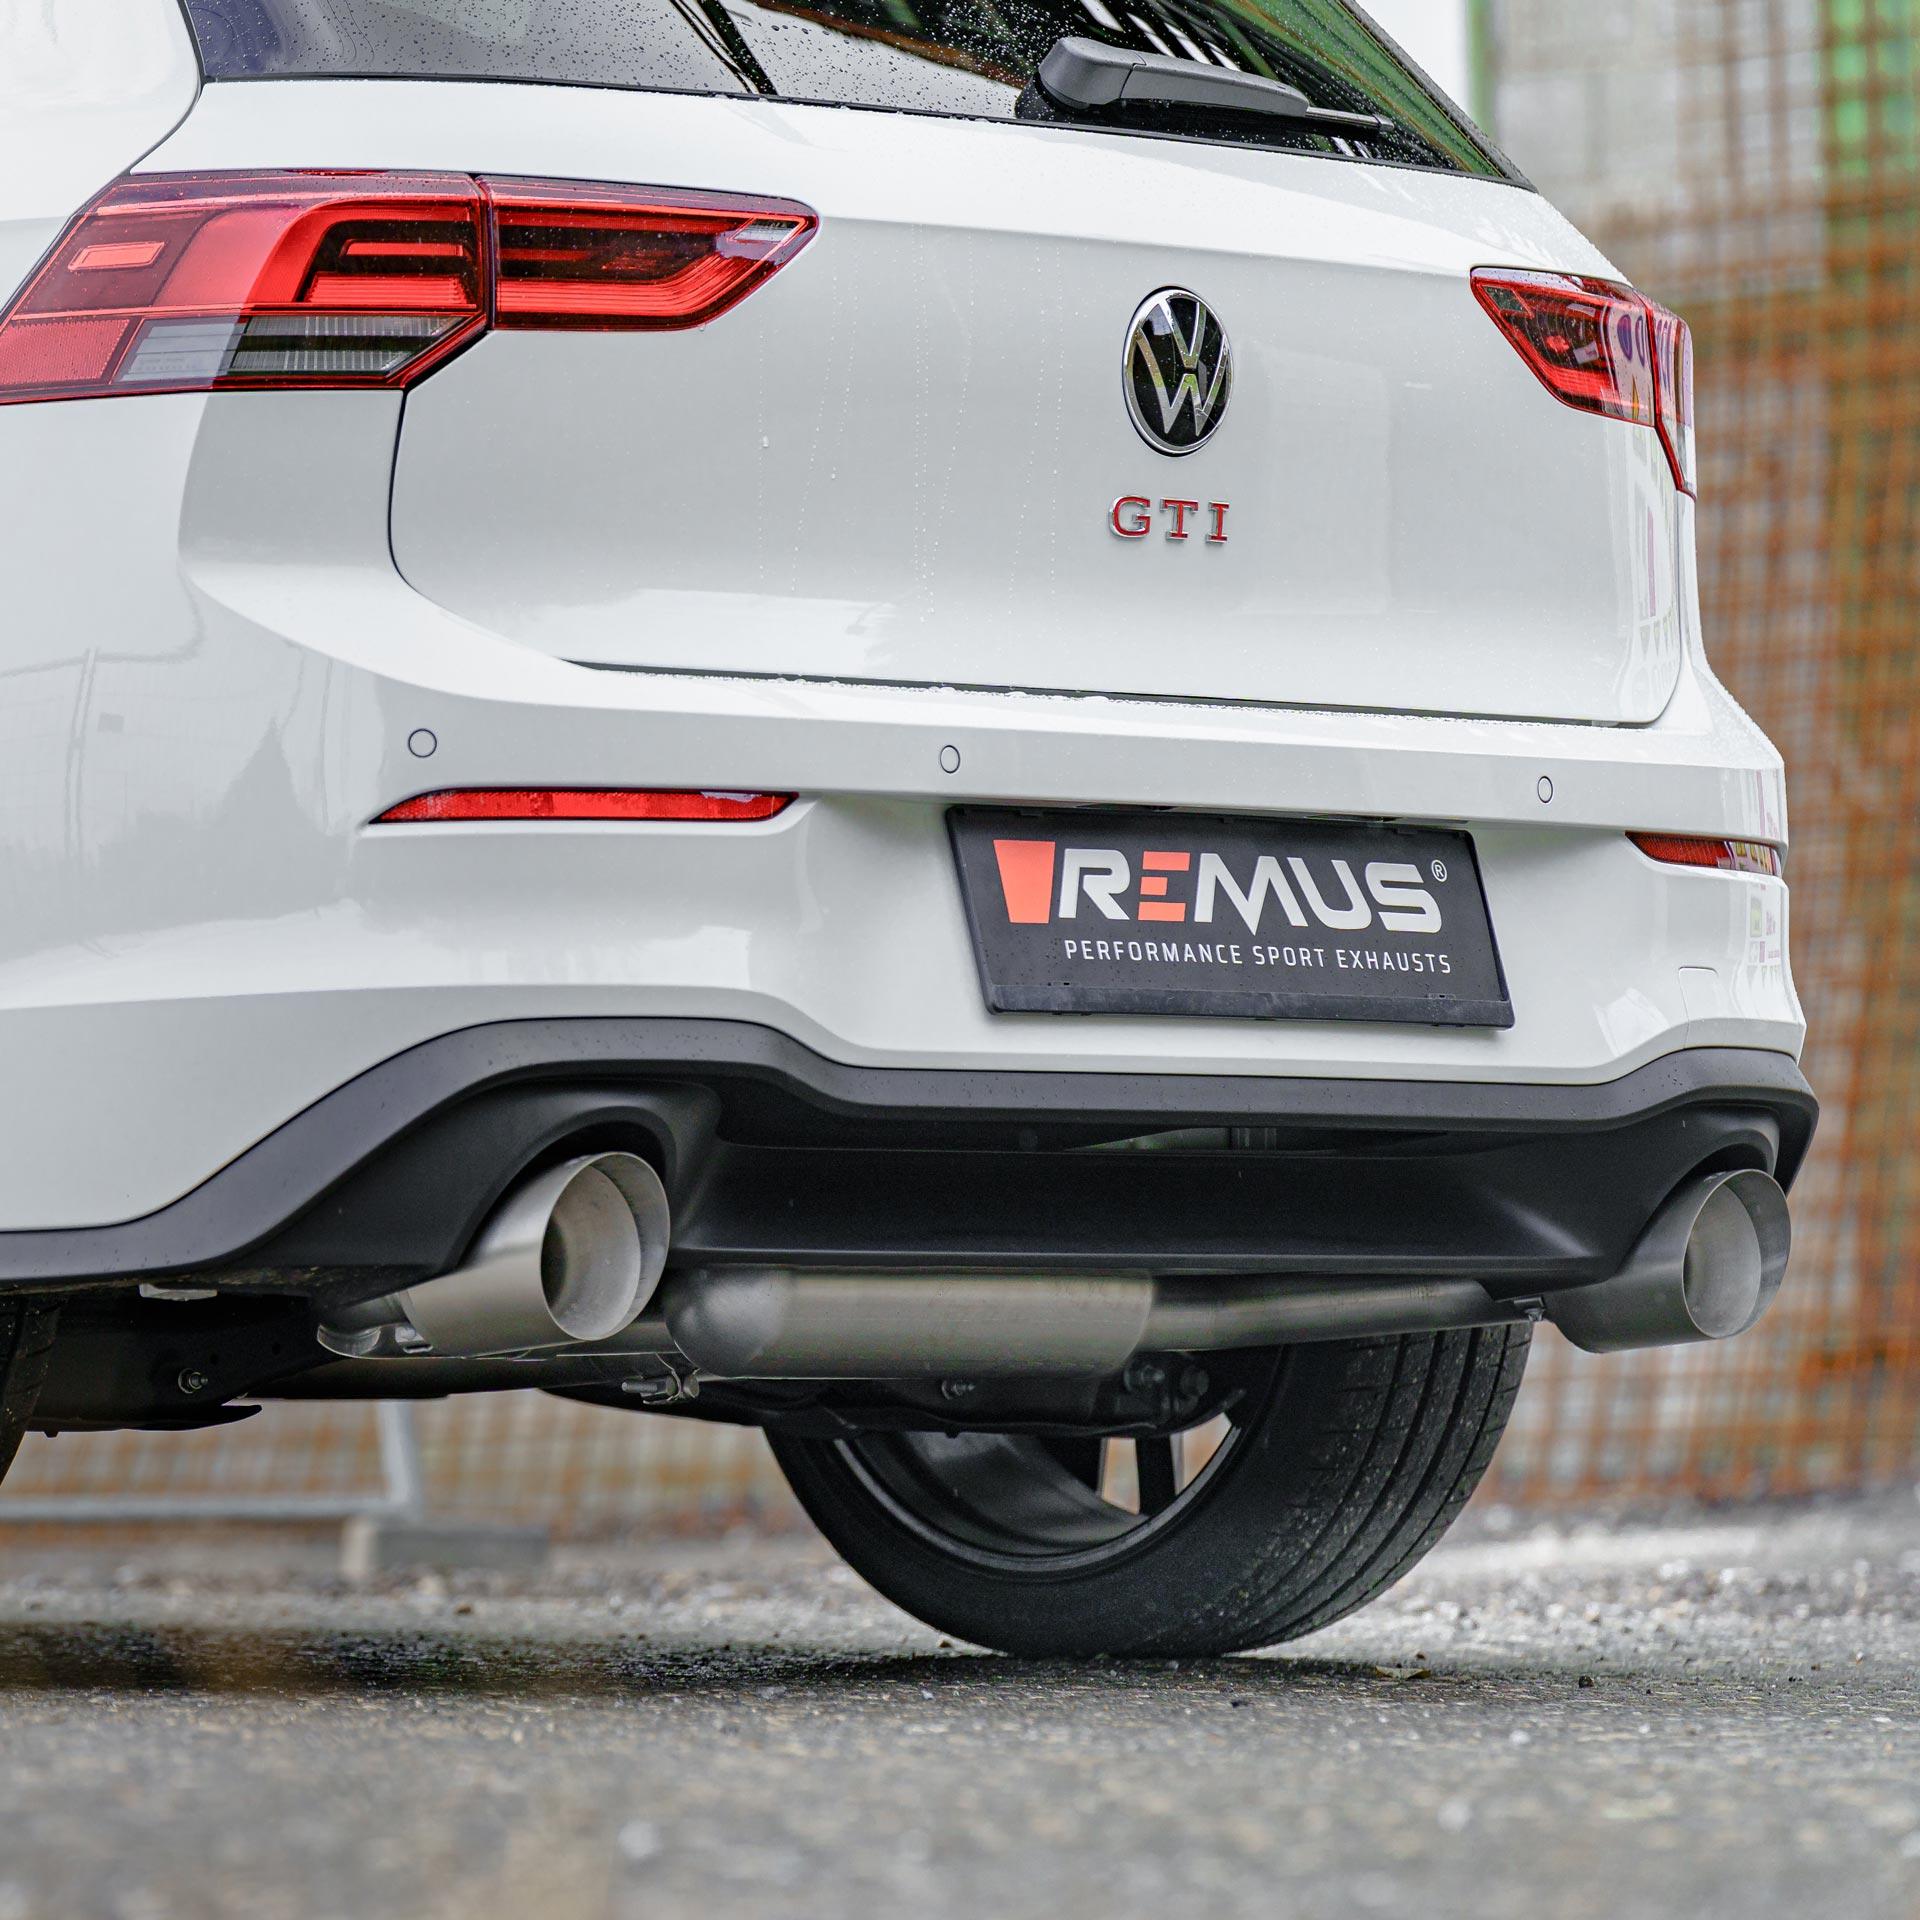 VW Golf 8 GTI REMUS sport exhaust system